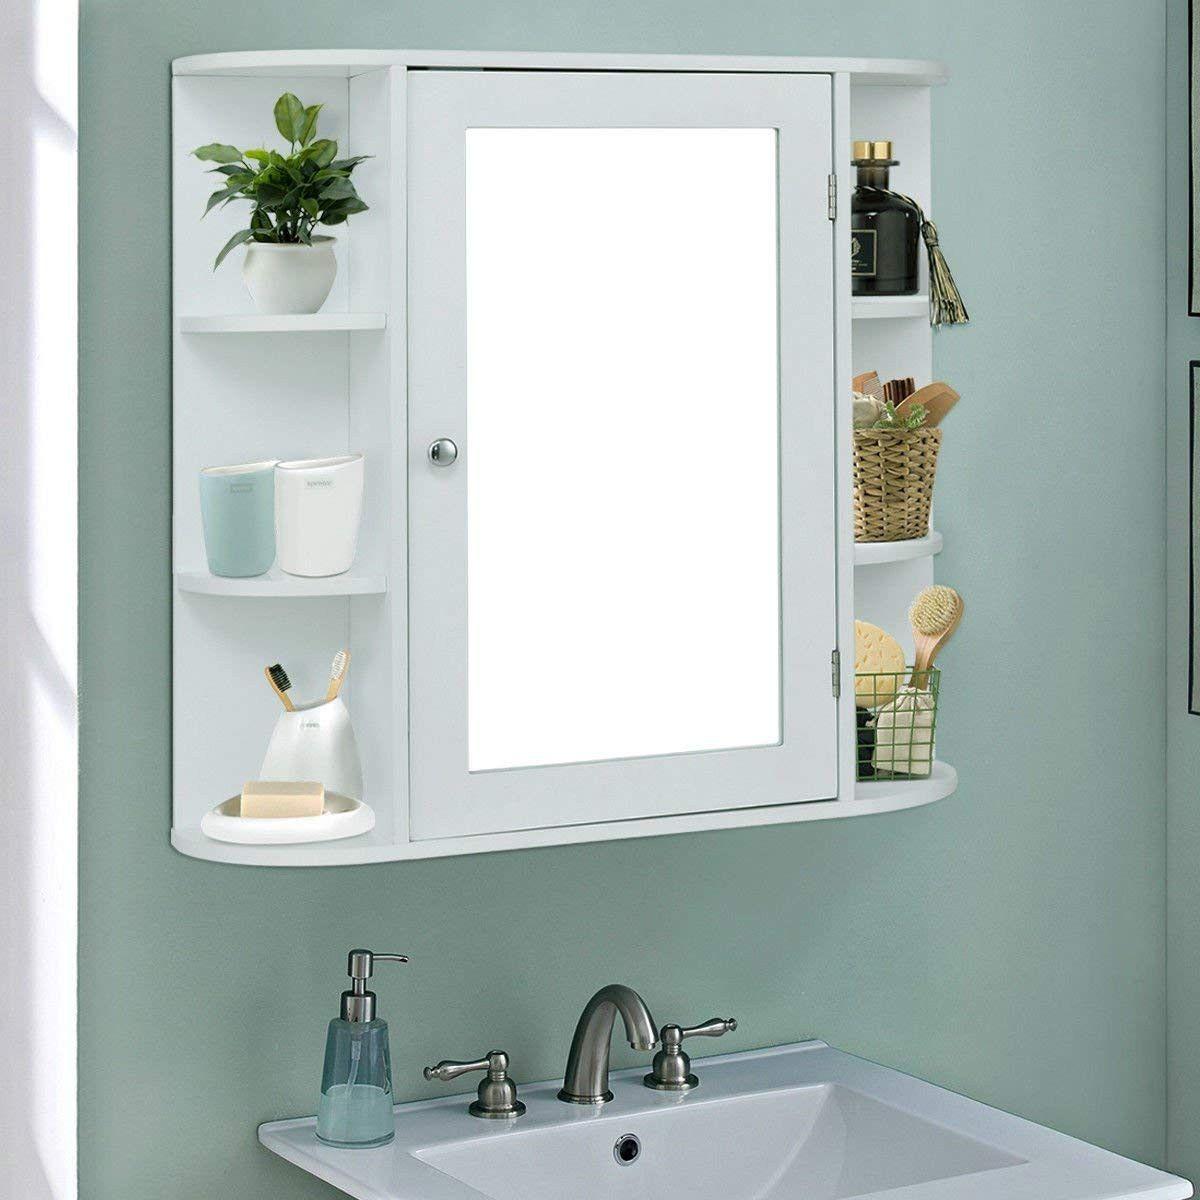 Giantex Wall Mounted Bathroom Storage Cabinet With Mirror Wall Mounted Bathroom Cabinets Bathroom Floor Cabinets Wood Bathroom Cabinets